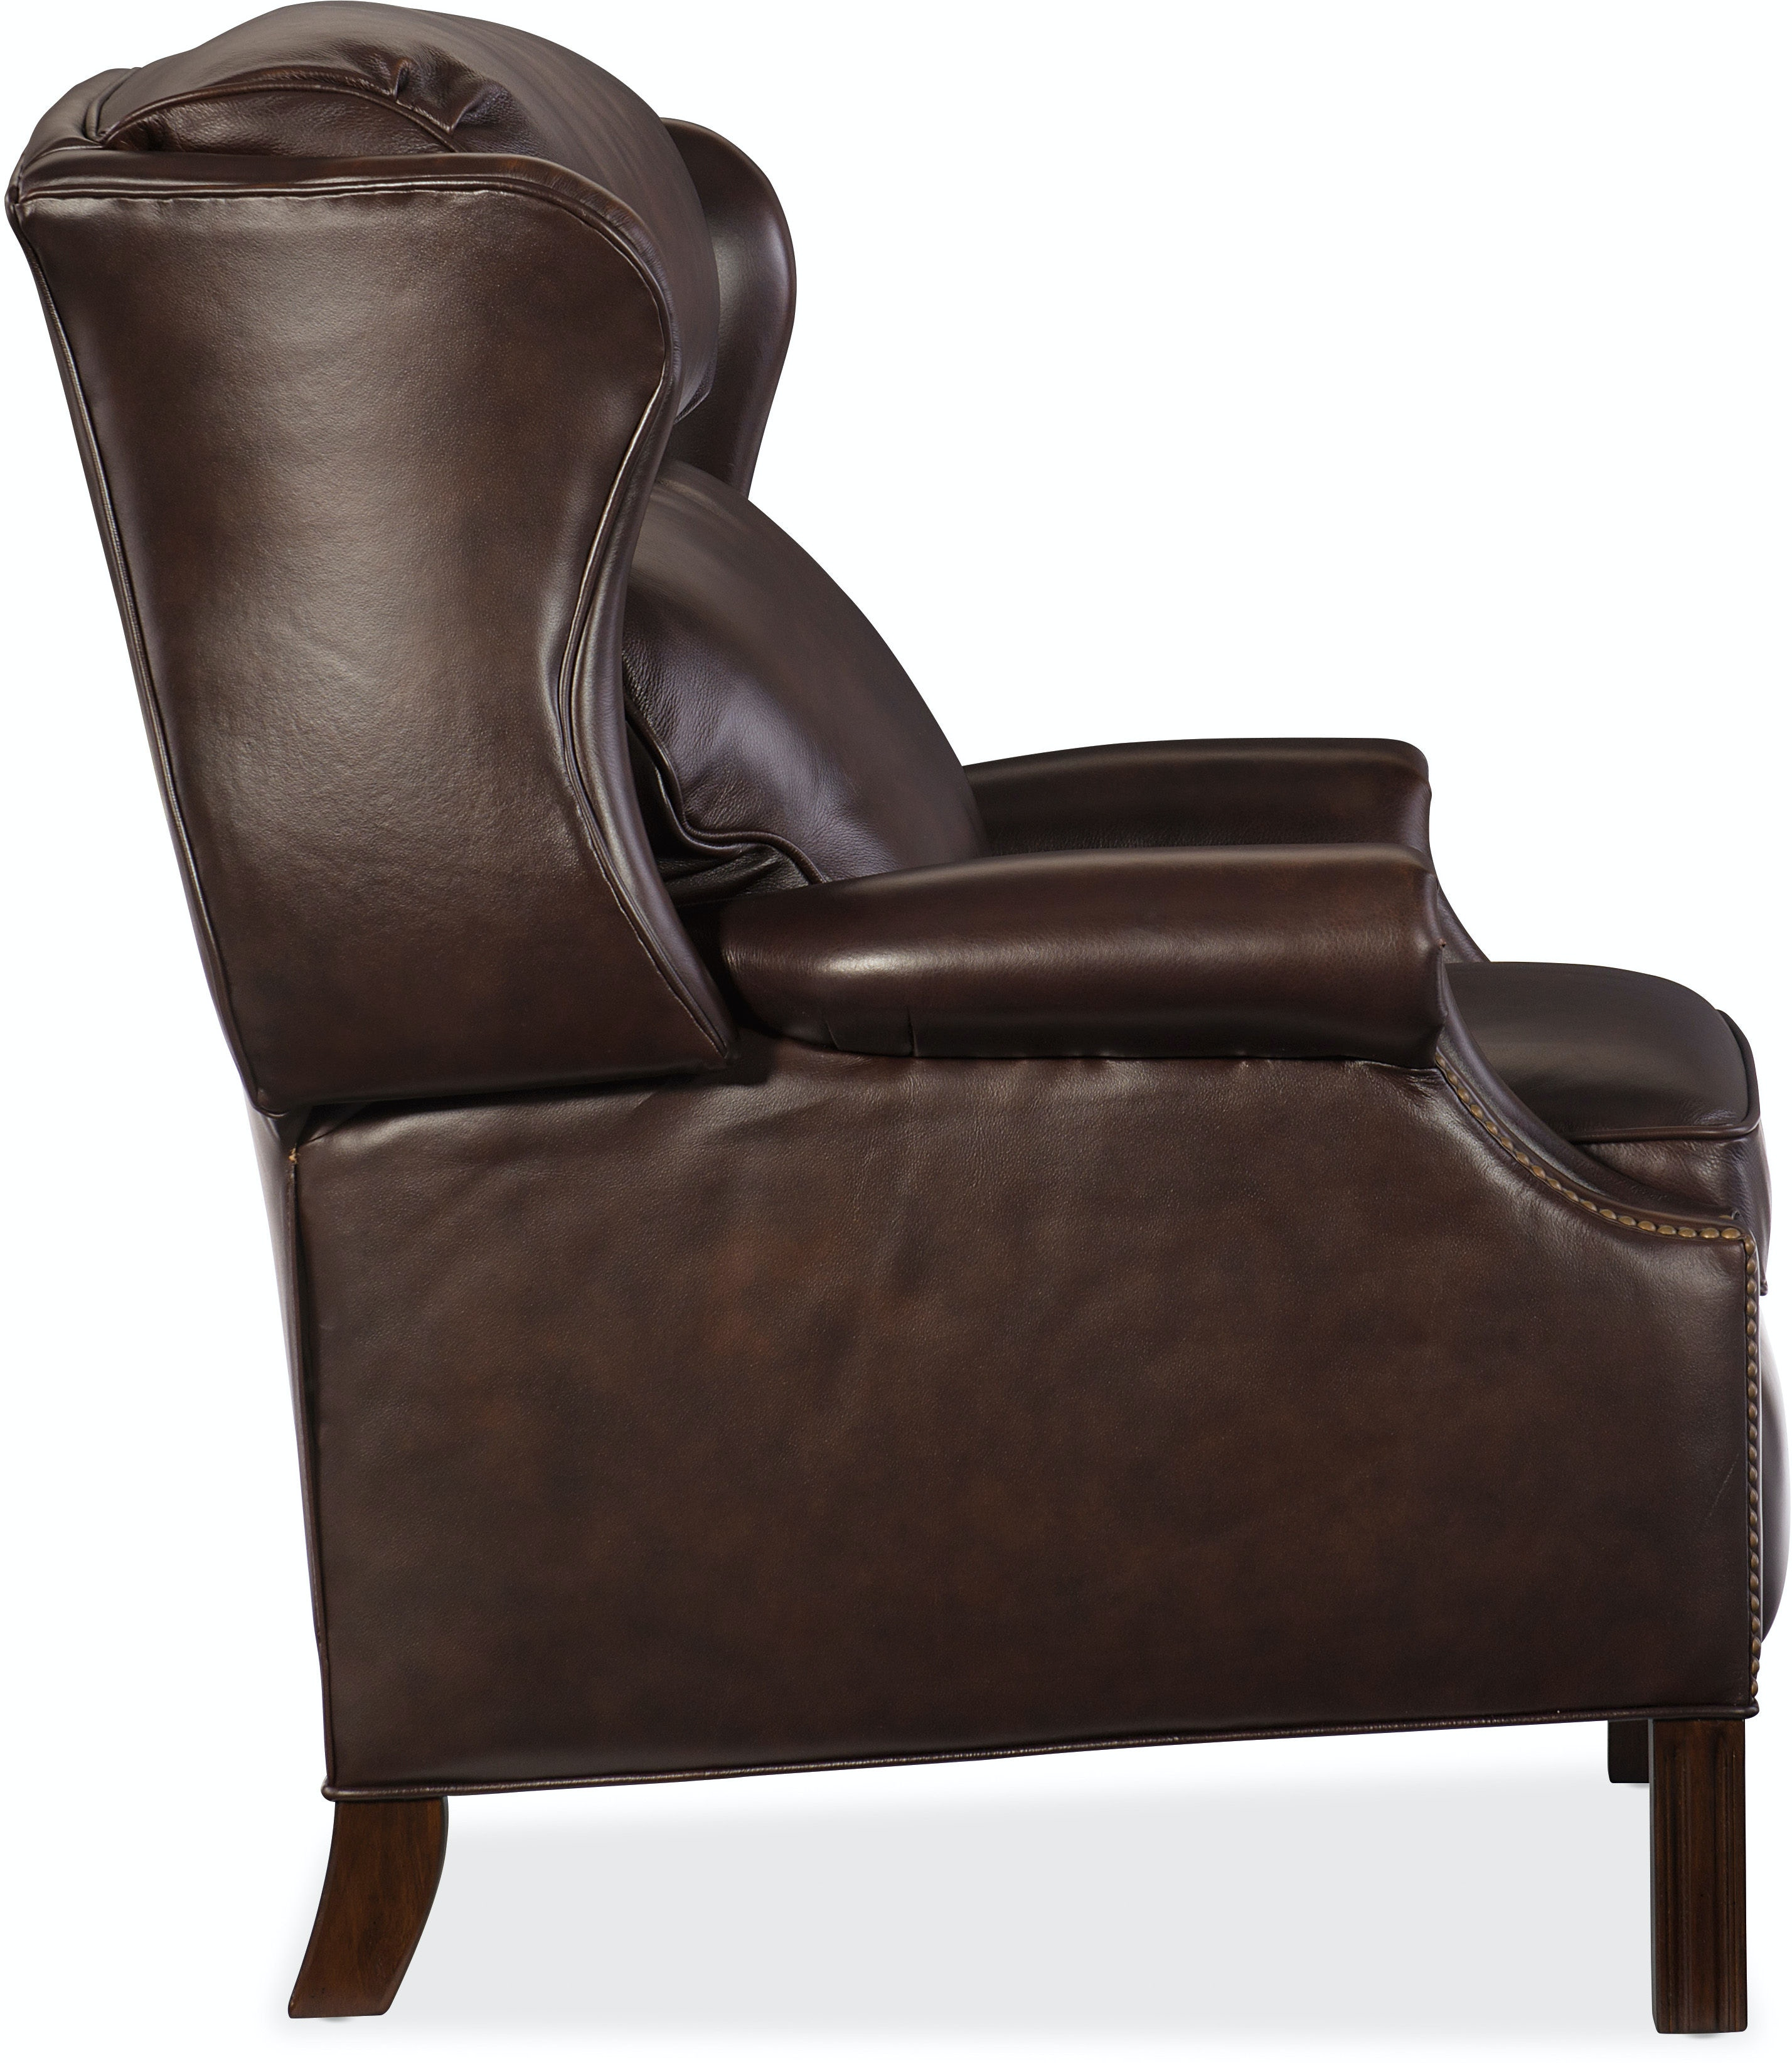 Hooker Furniture Living Room Finley Recliner Chair Rc214 203